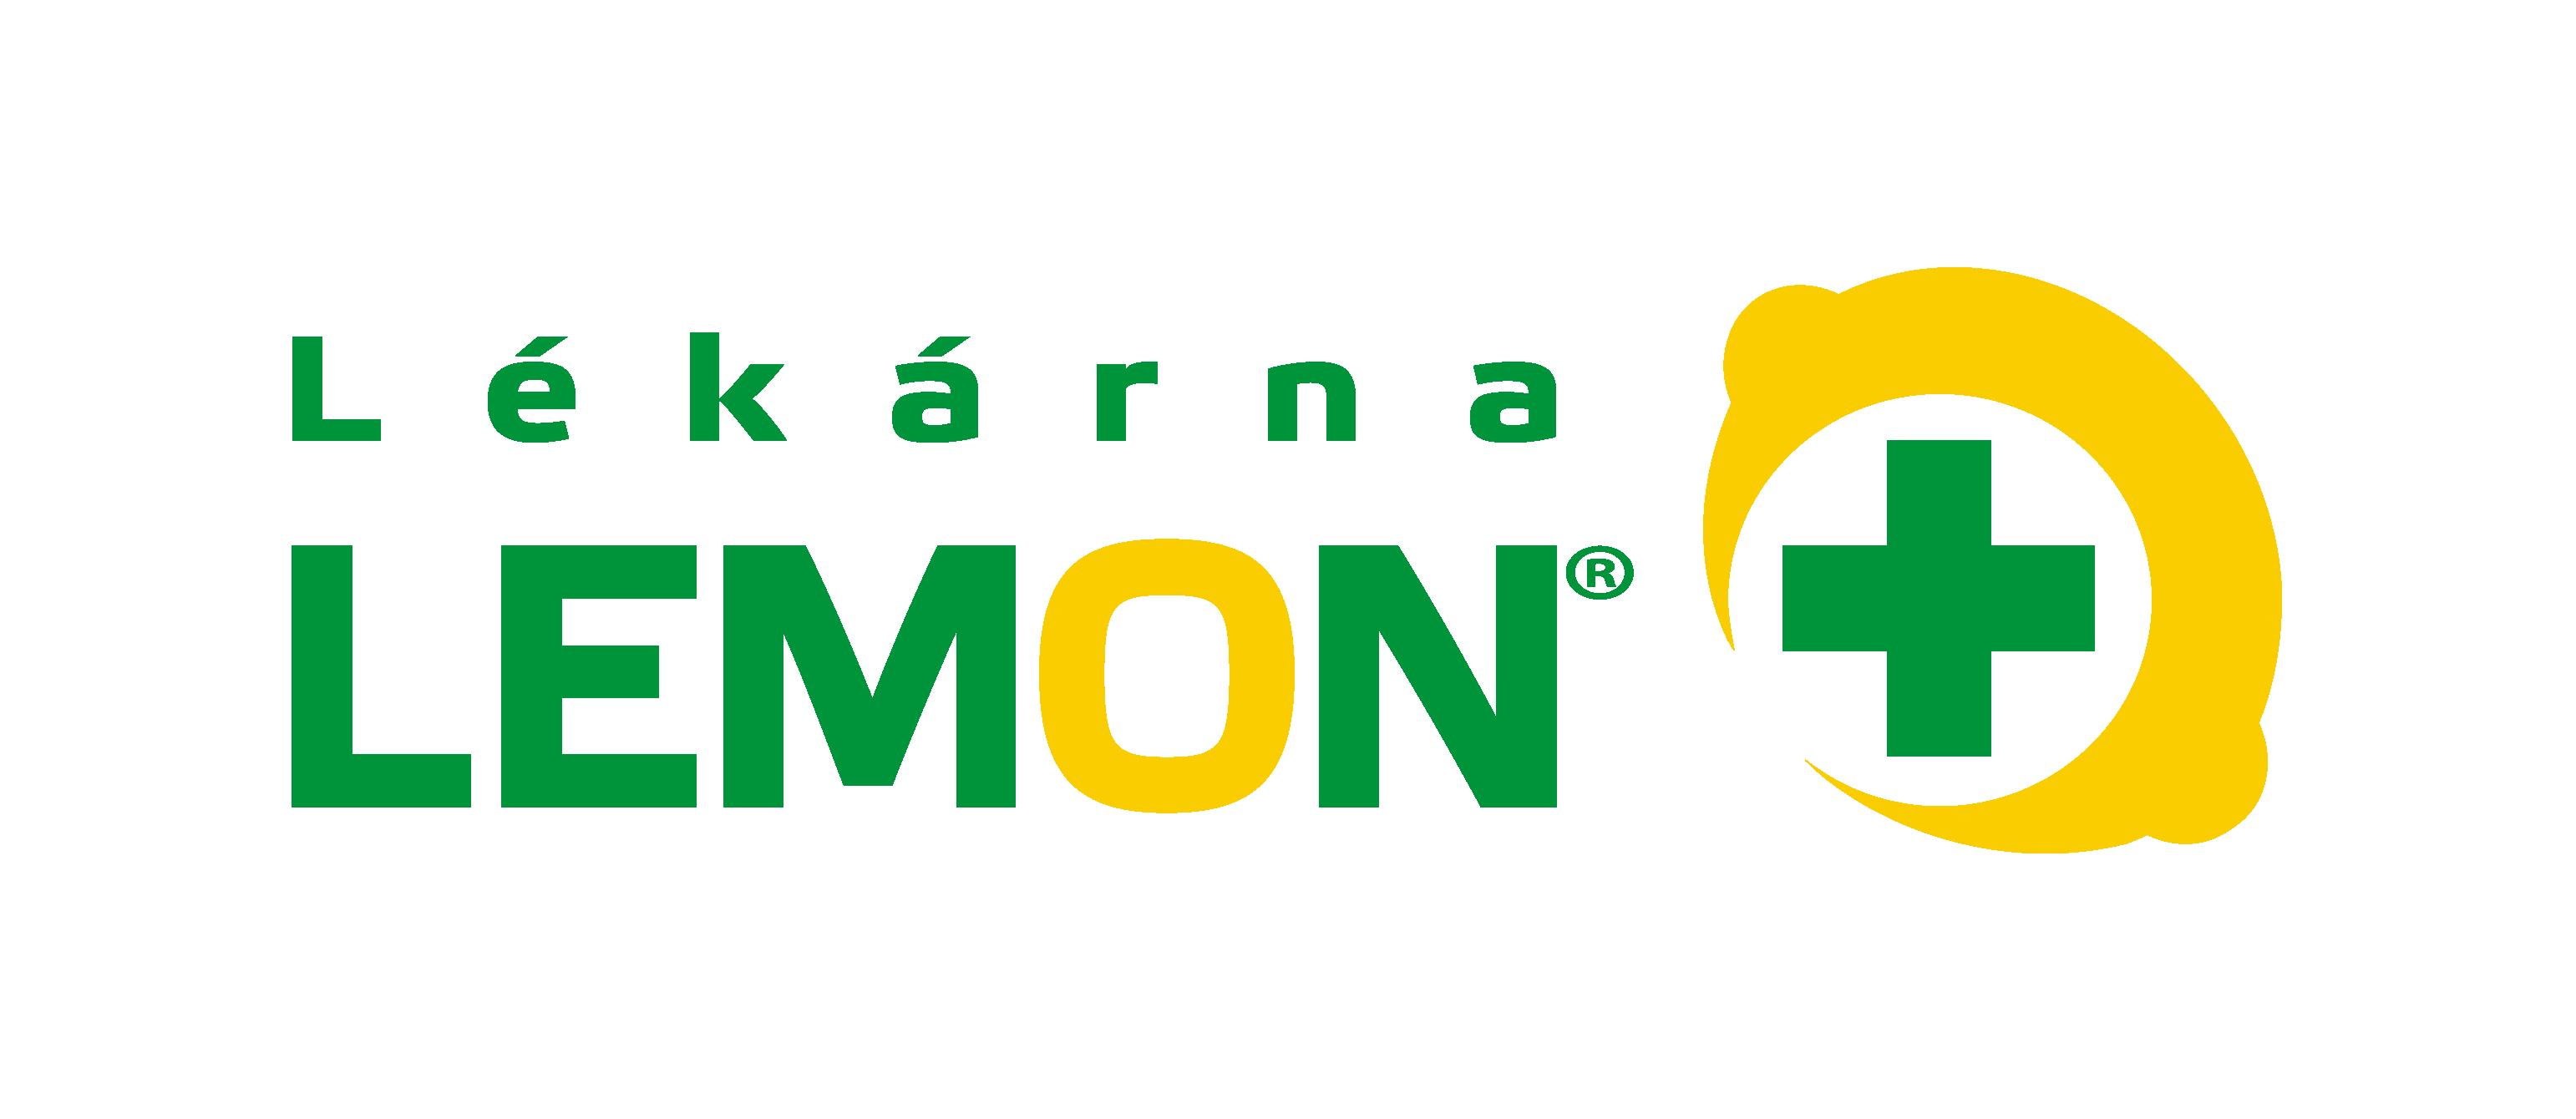 logo lékárna lemon